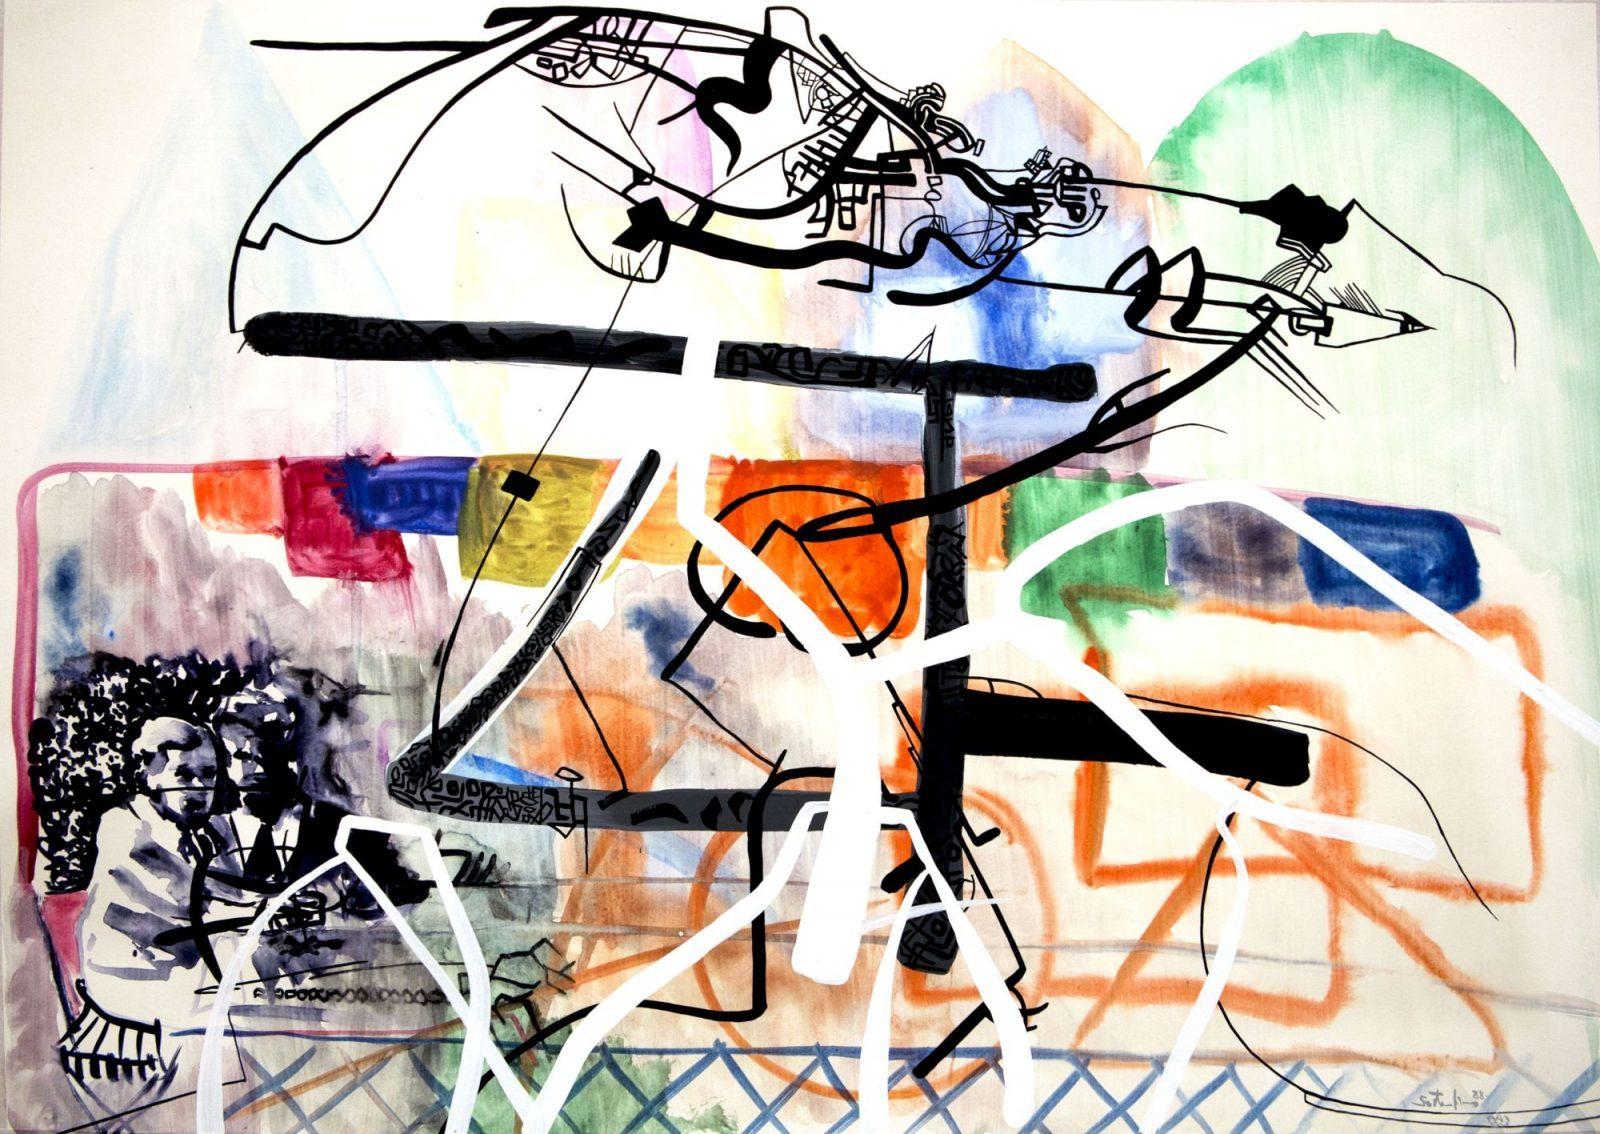 János Szirtes: Sketch 4